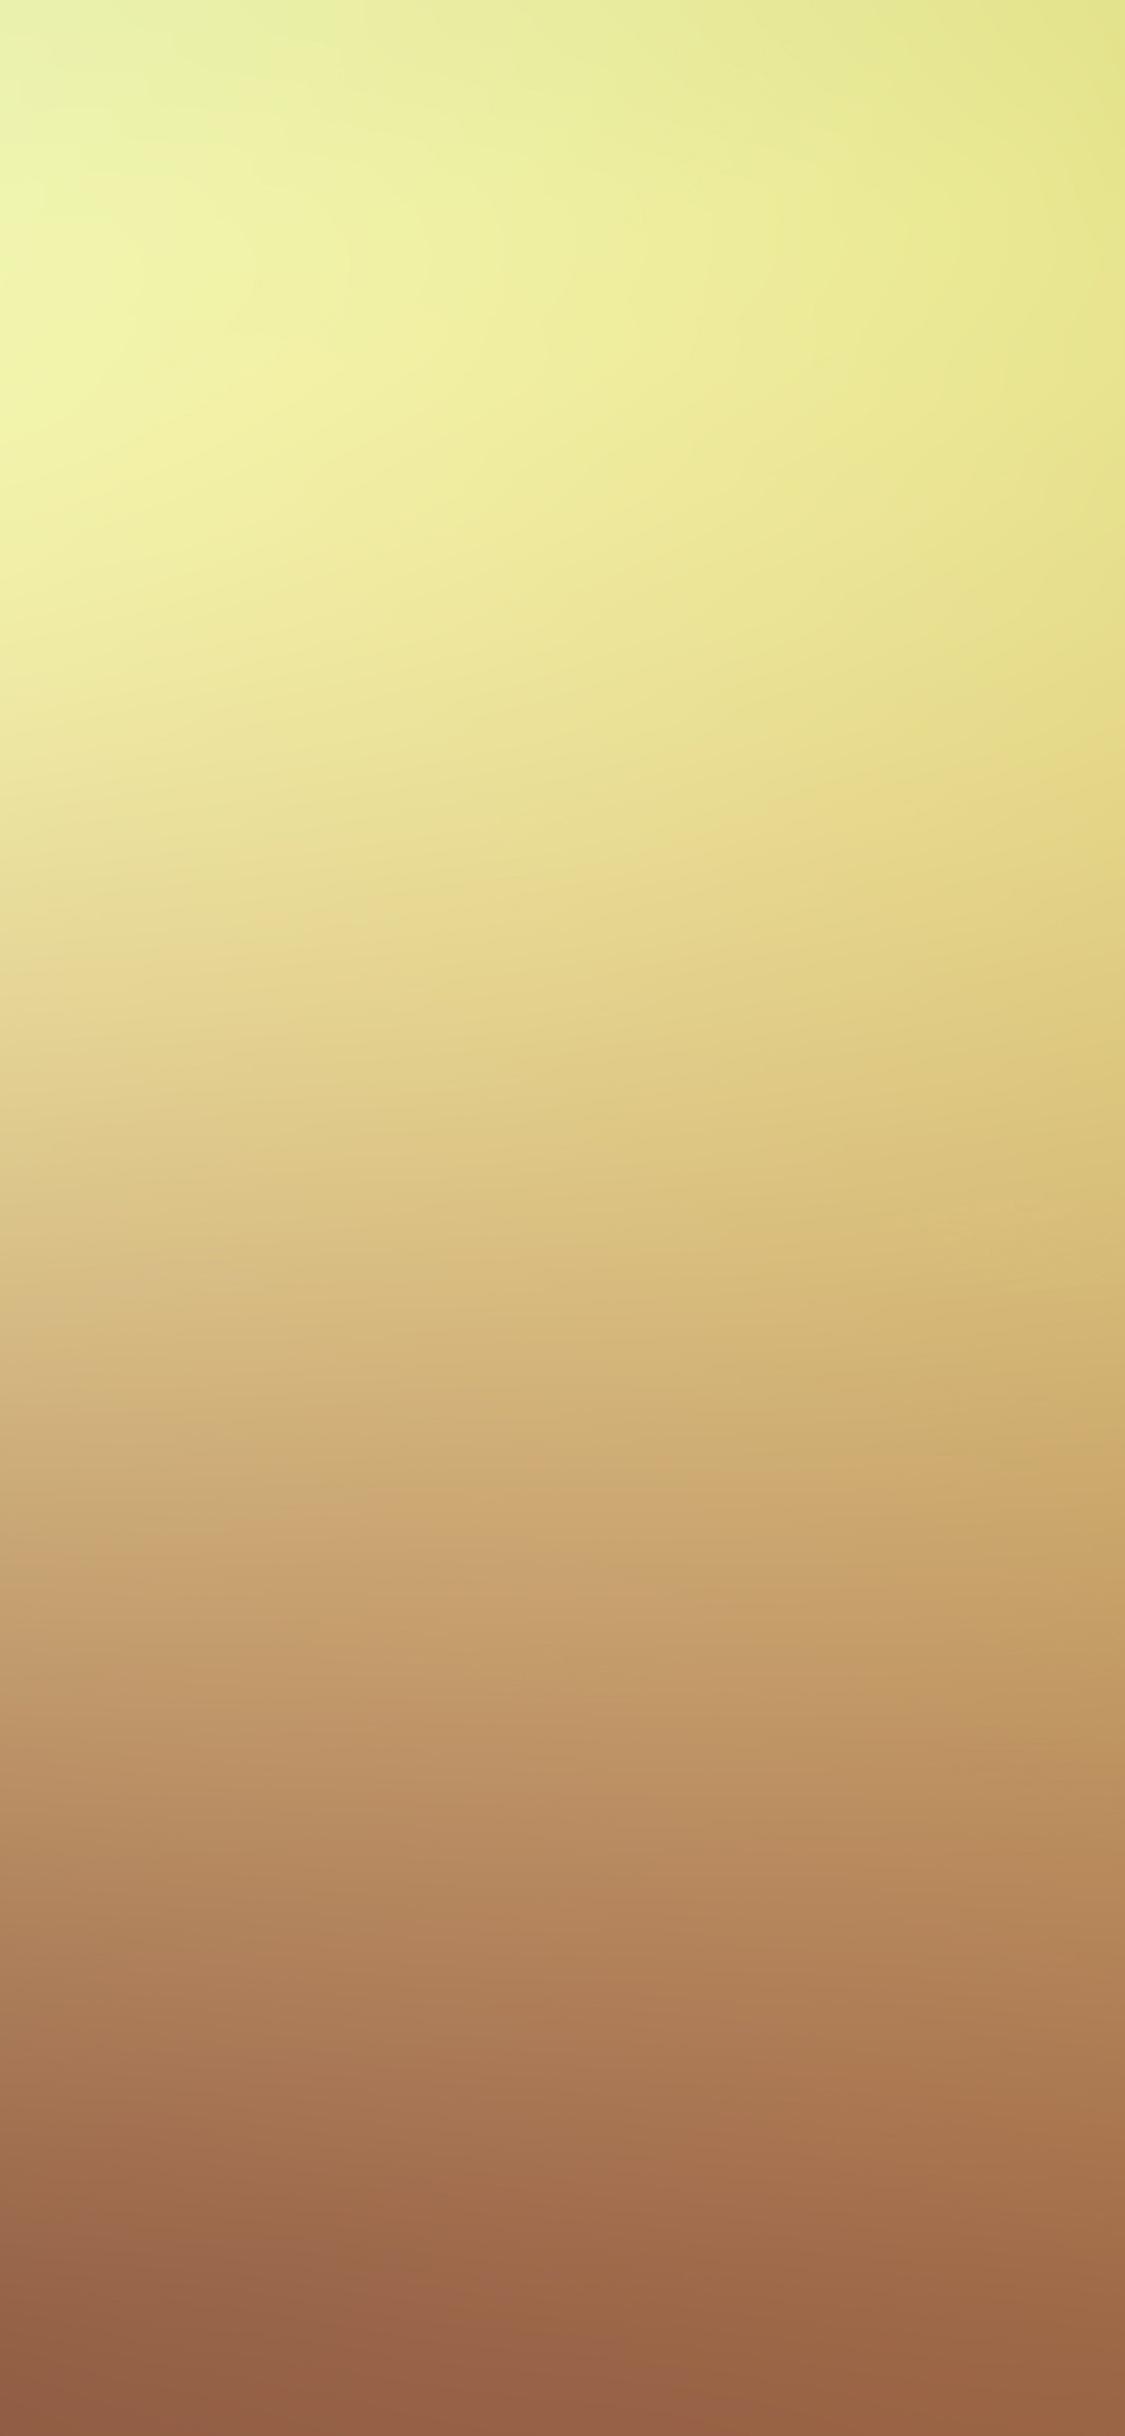 iPhoneXpapers.com-Apple-iPhone-wallpaper-se13-weed-grass-flower-gradation-blur